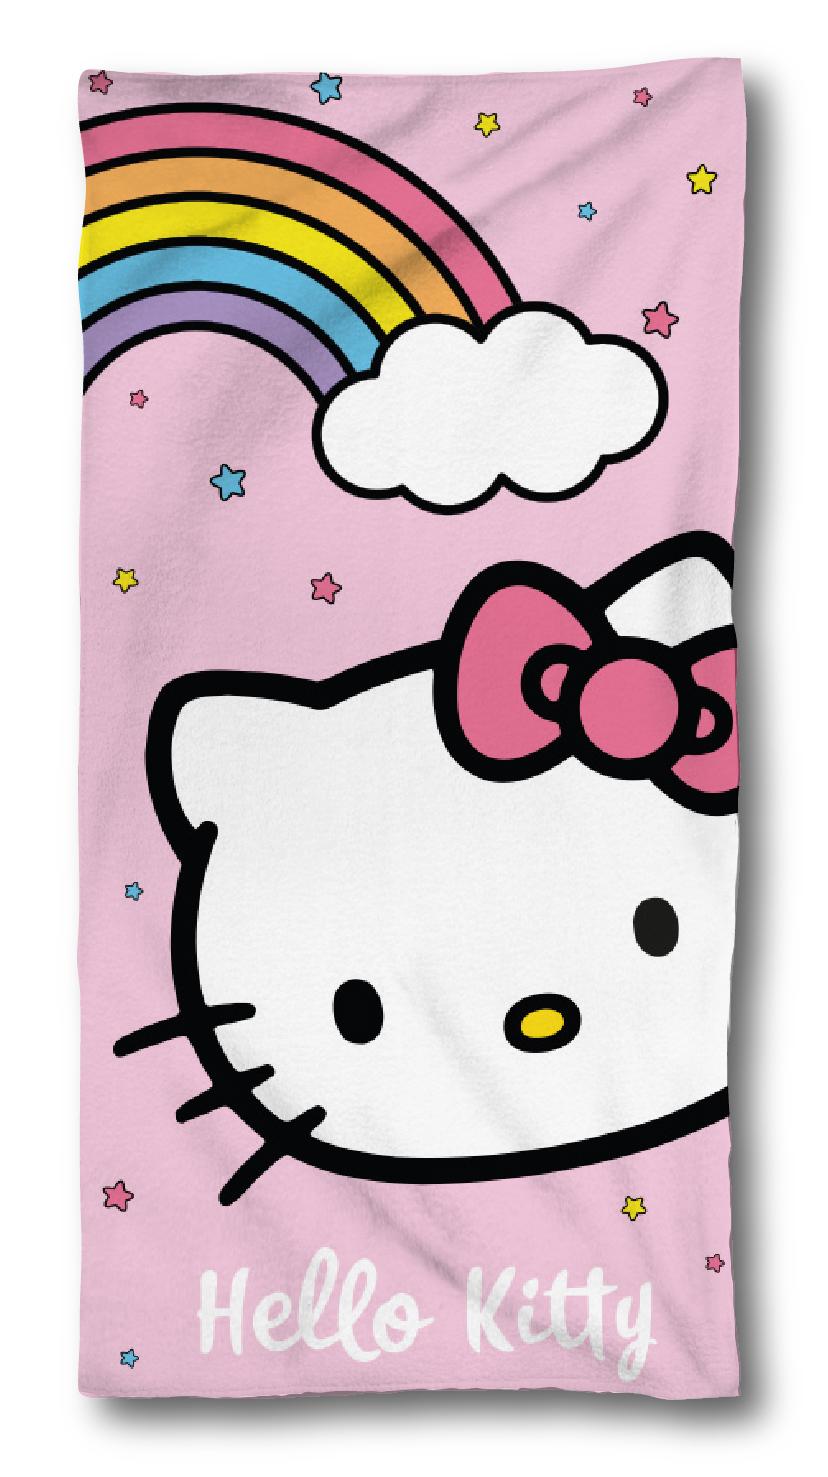 Towel - 70 x 140 cm - Hello Kitty (HK005)